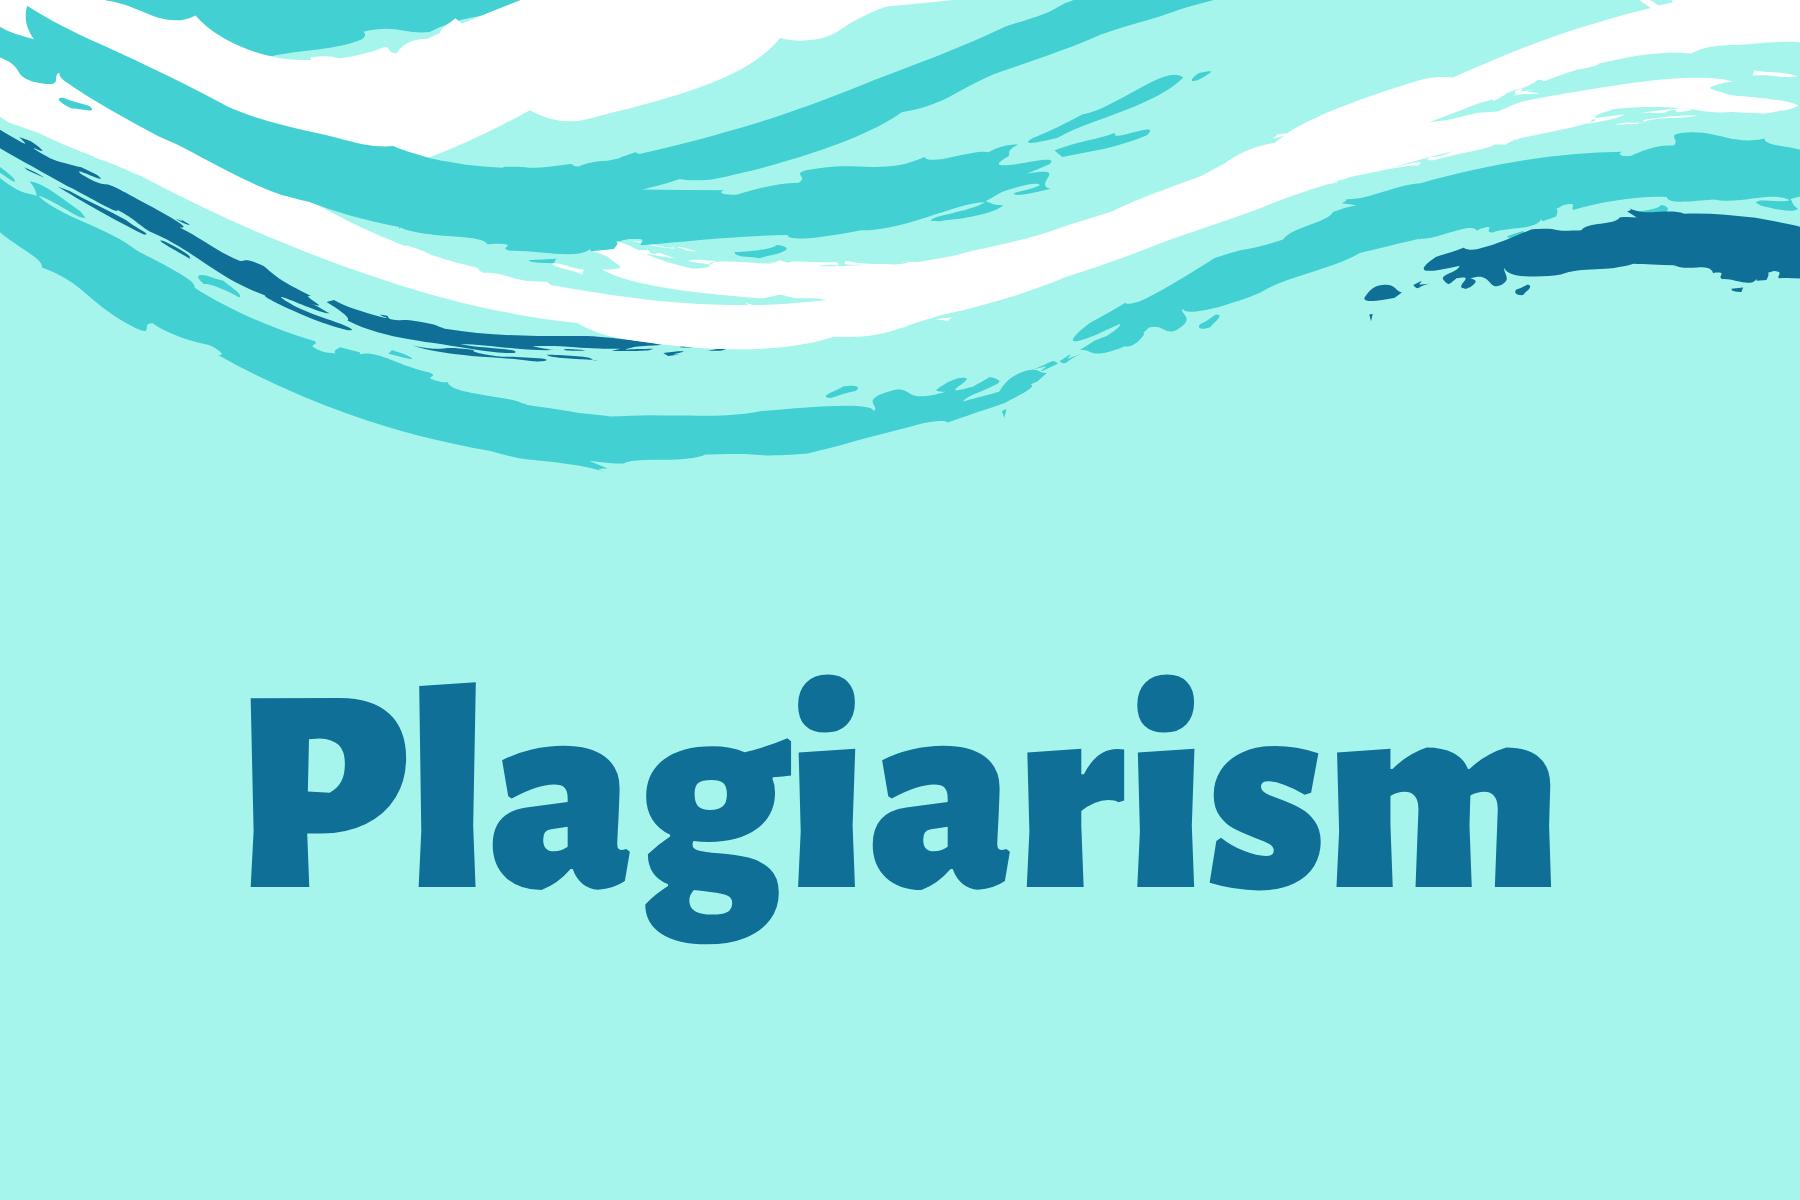 Plagiarism Information